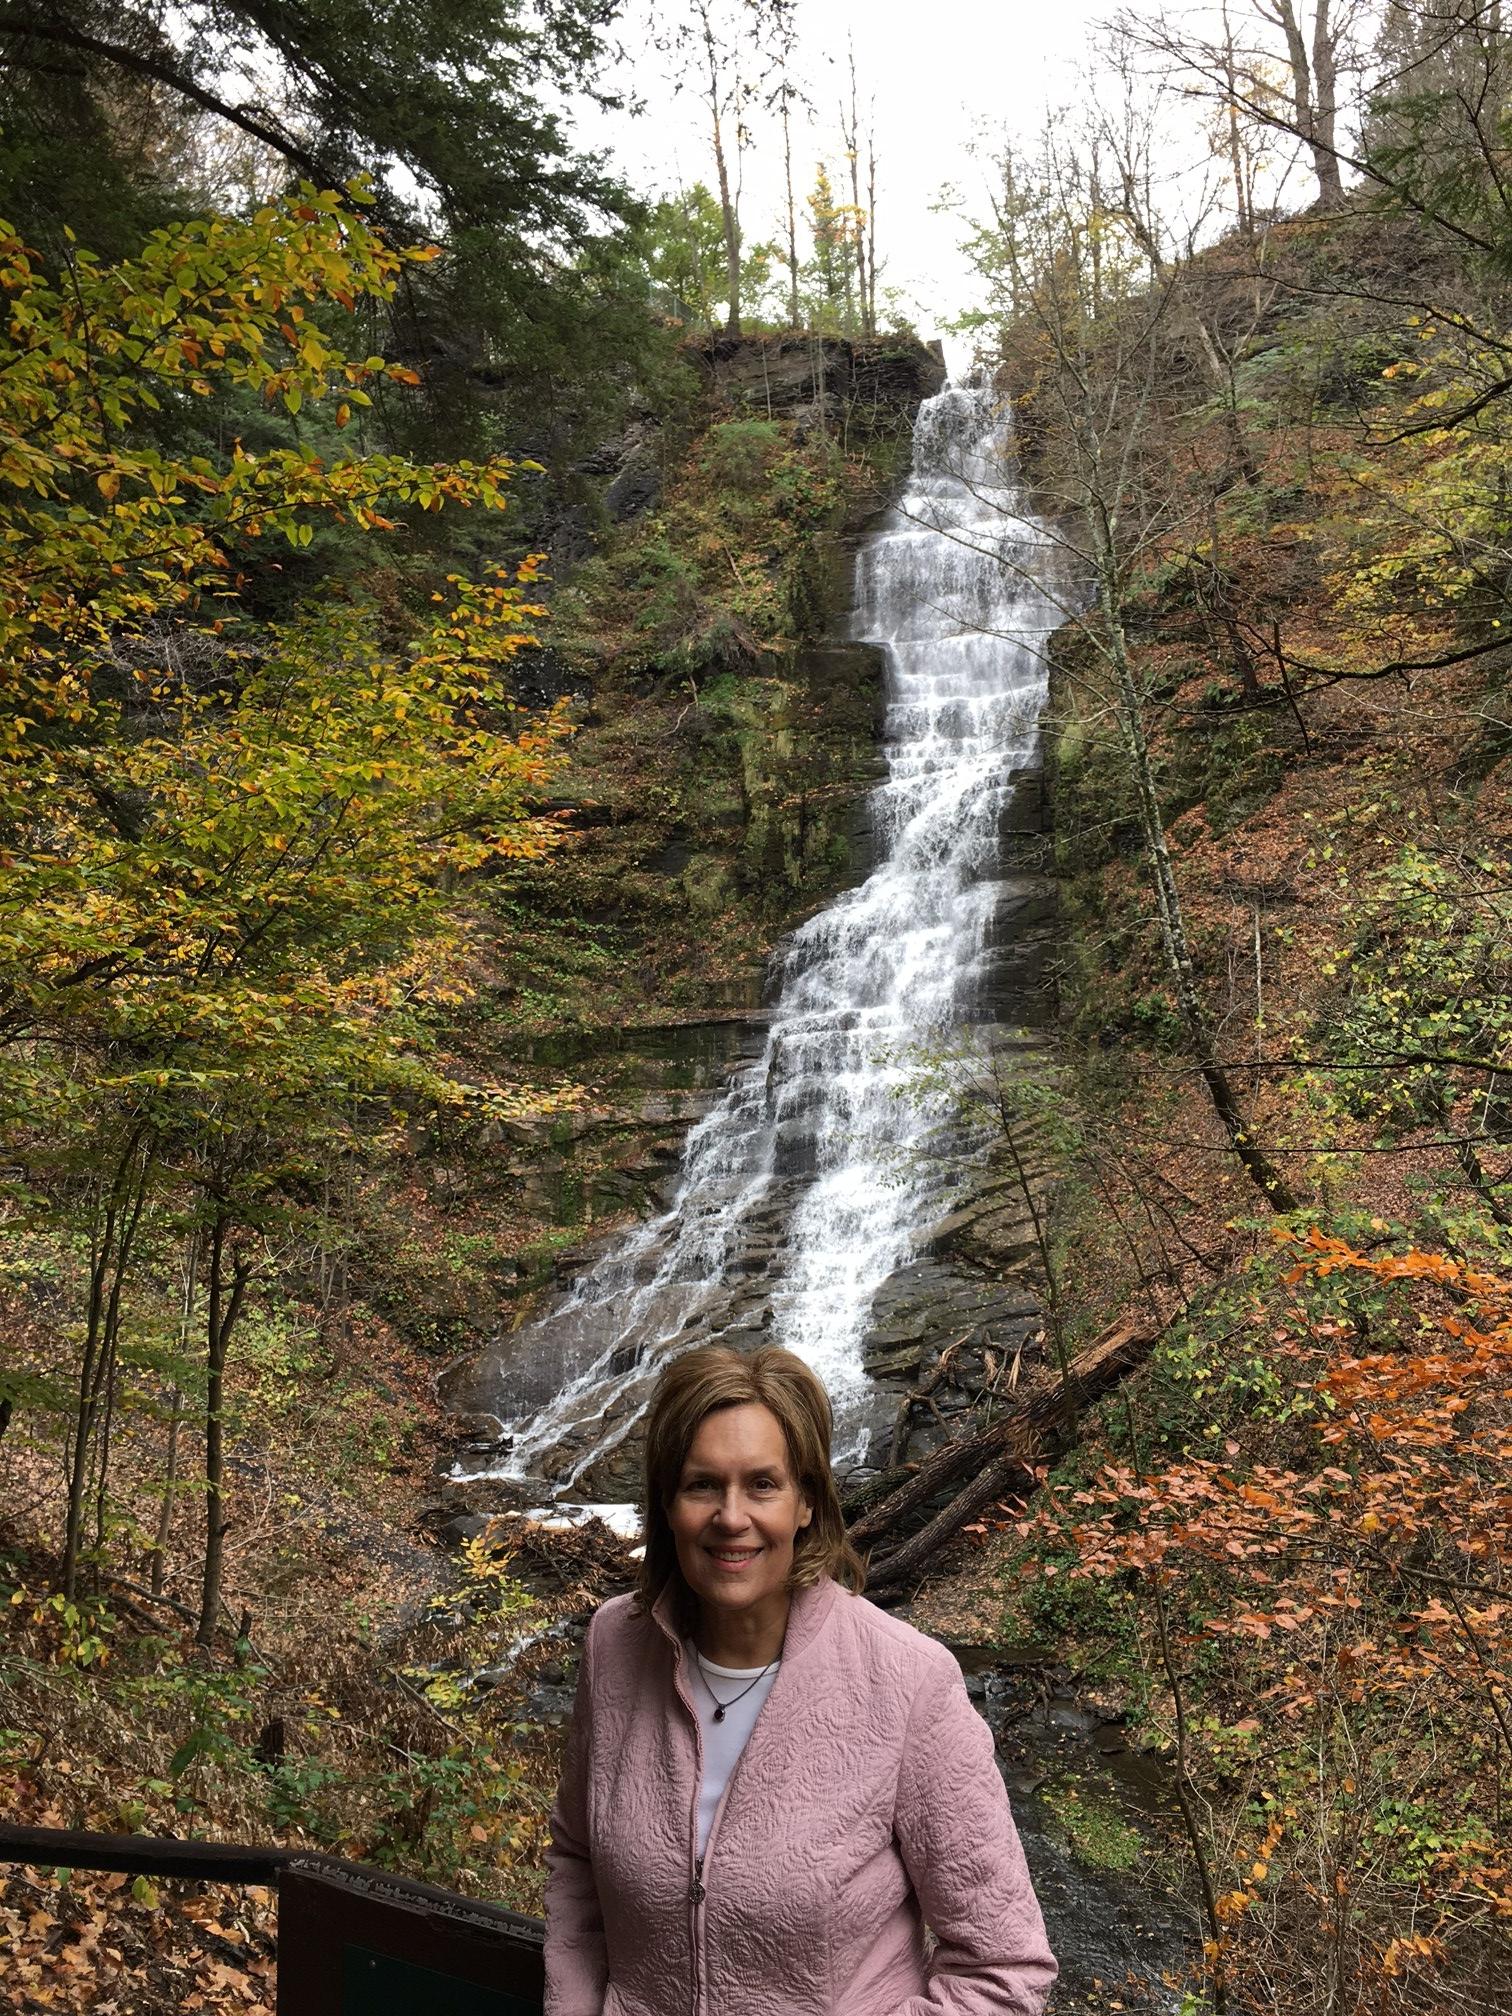 Lorraine Gudas at Pratt's Falls, near Jamesville, NY